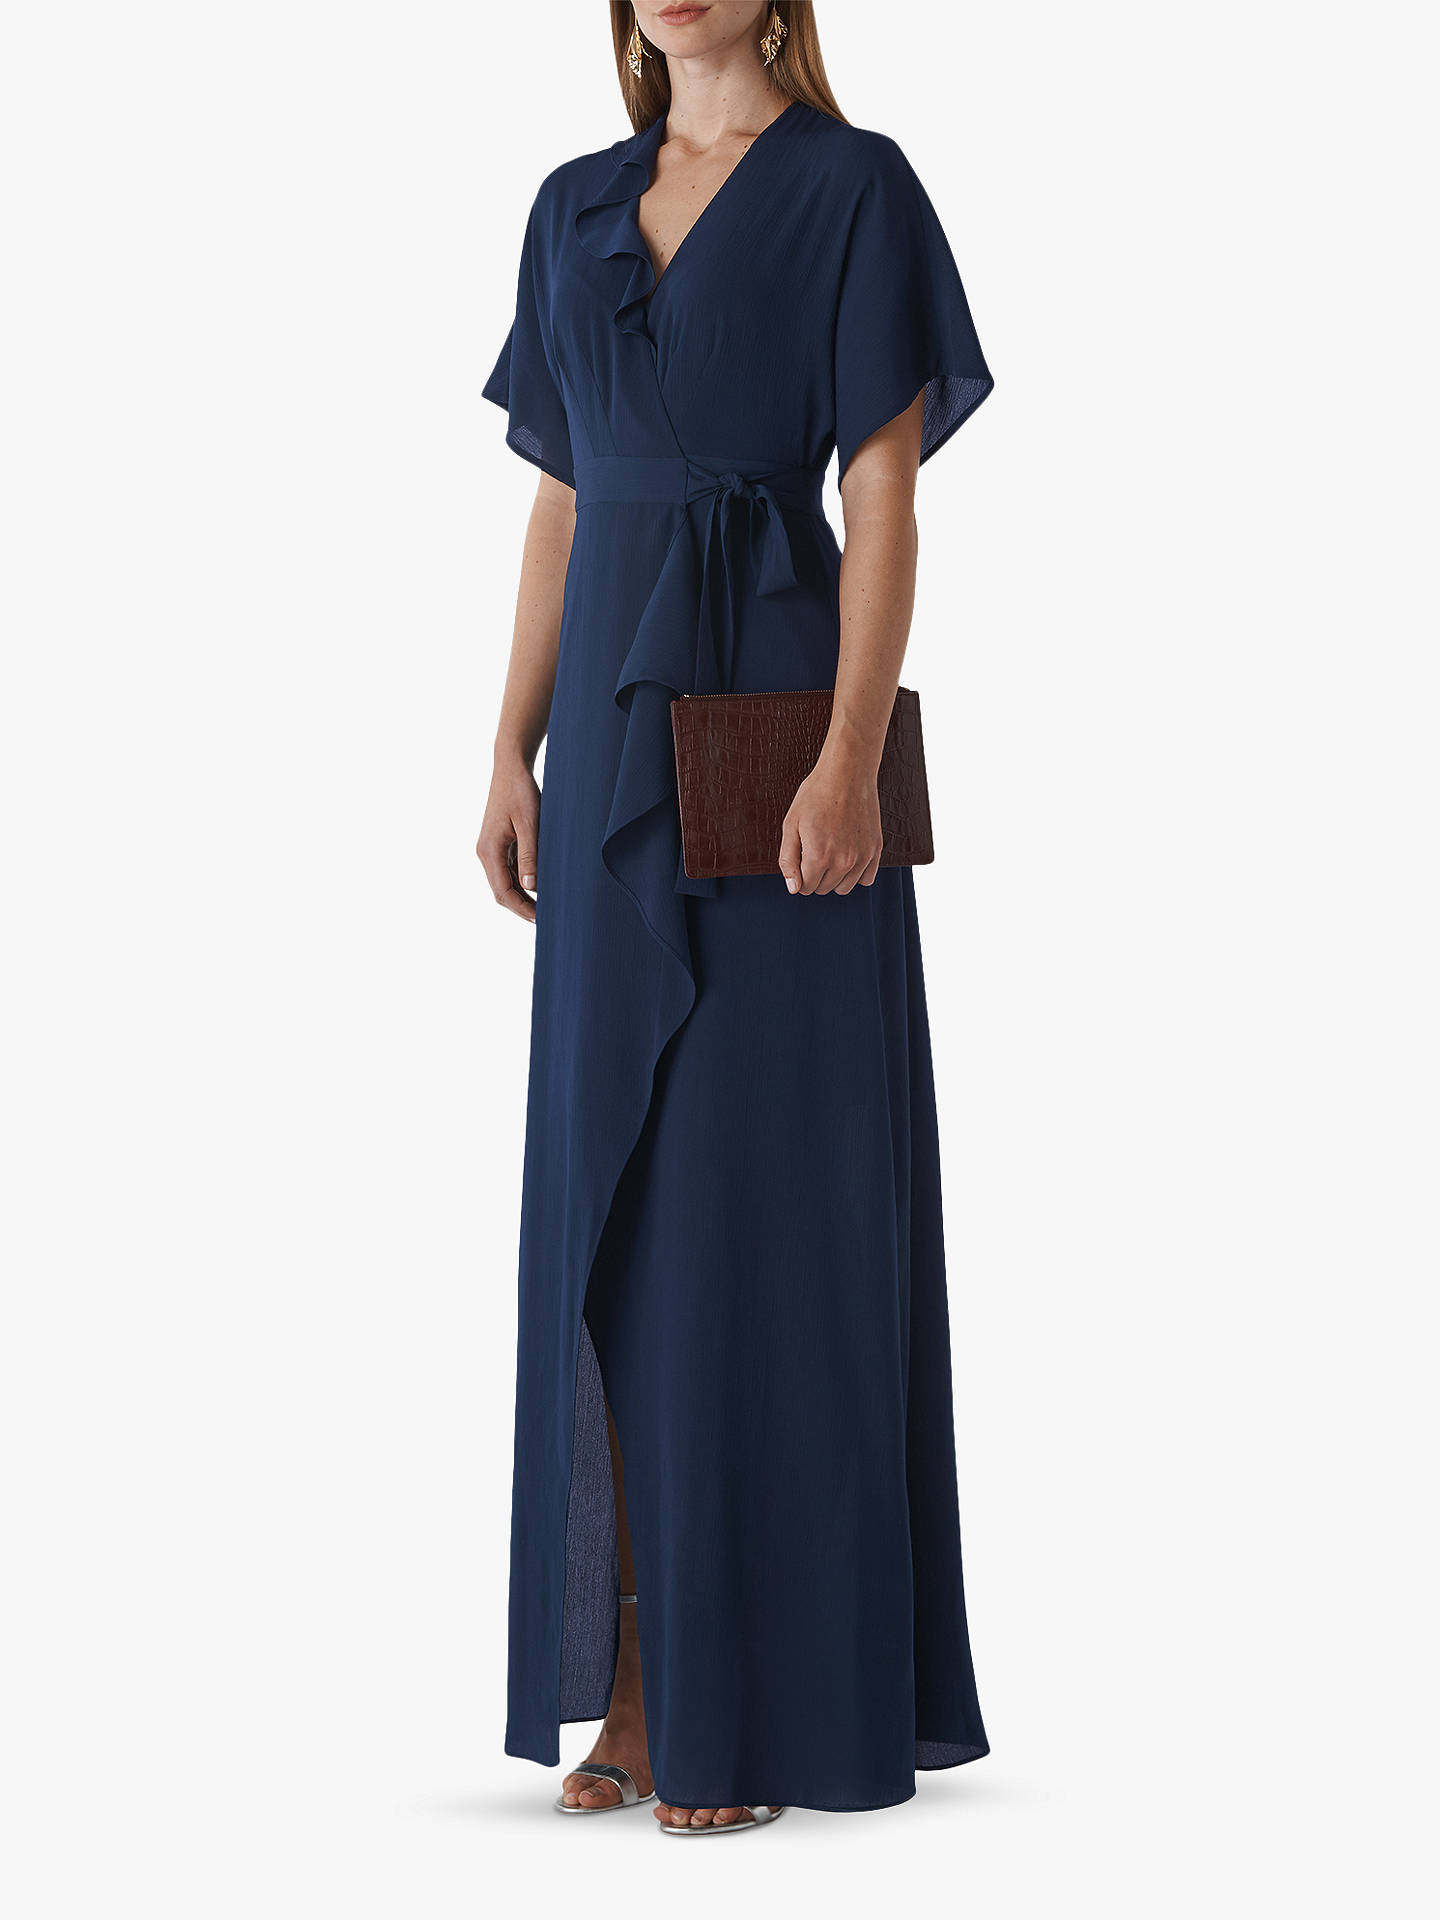 47430d82056 Buy Whistles Nova Frill Wrap Maxi Dress